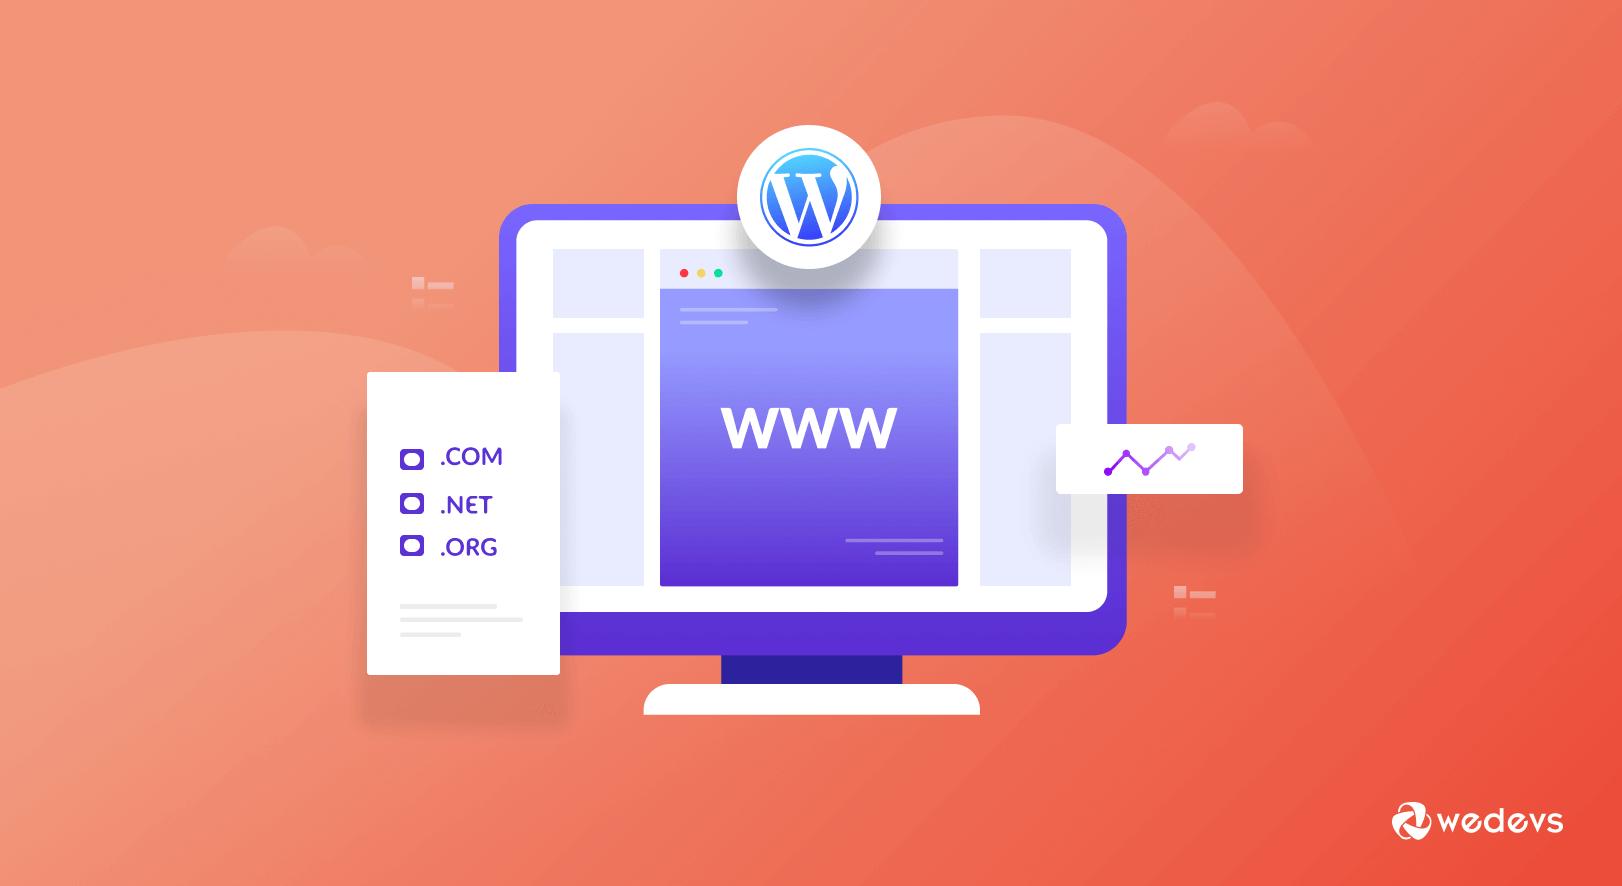 How to Improve the Domain Authority of WordPress Website